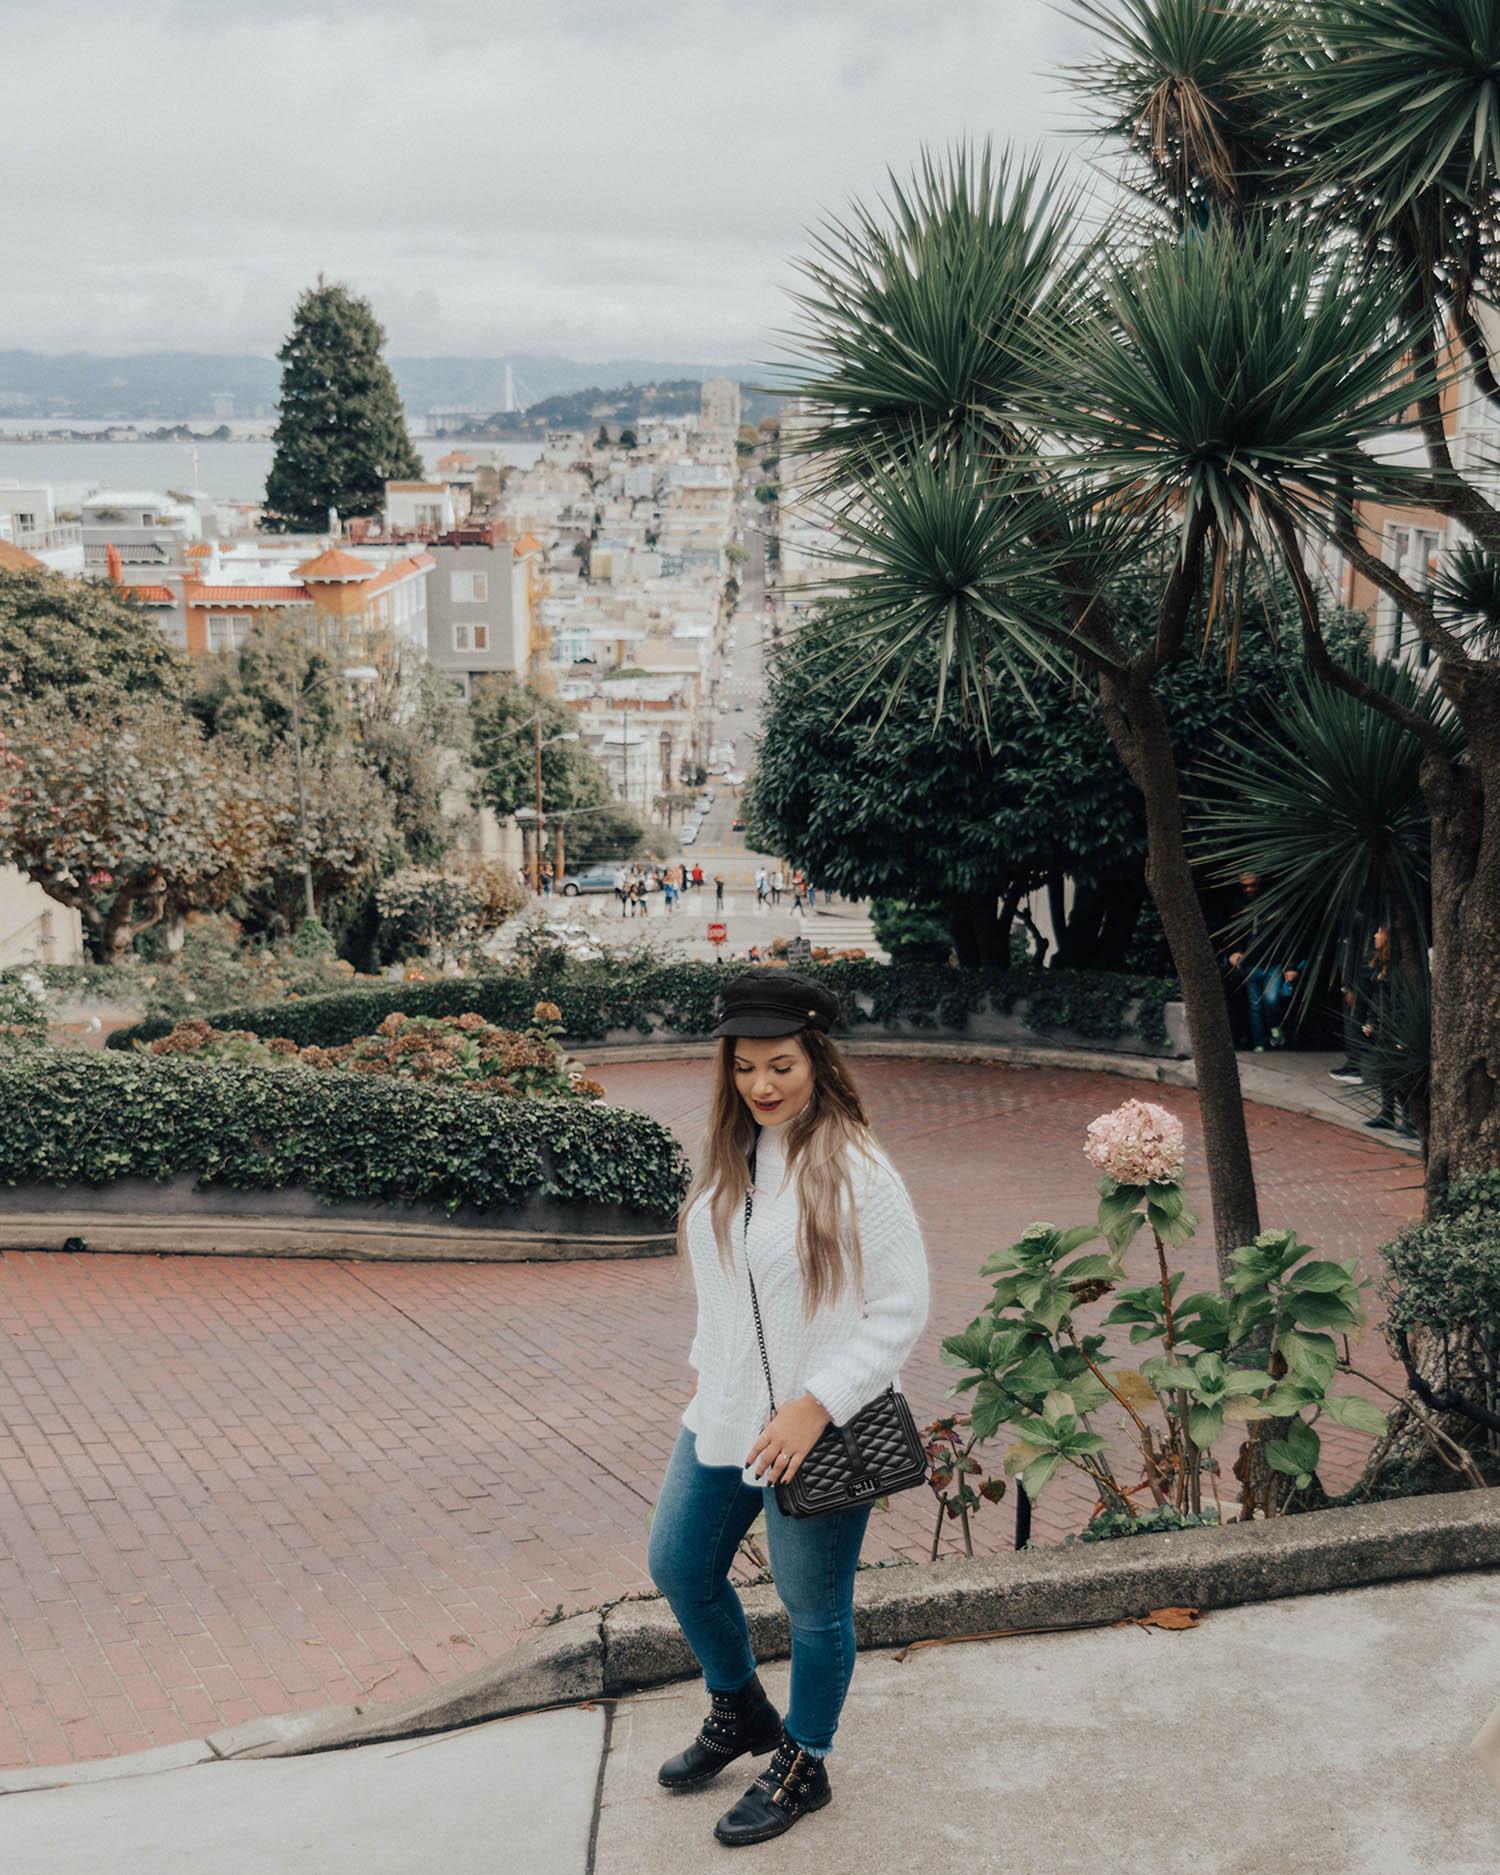 Adaras at Lombard Street, San Francisco